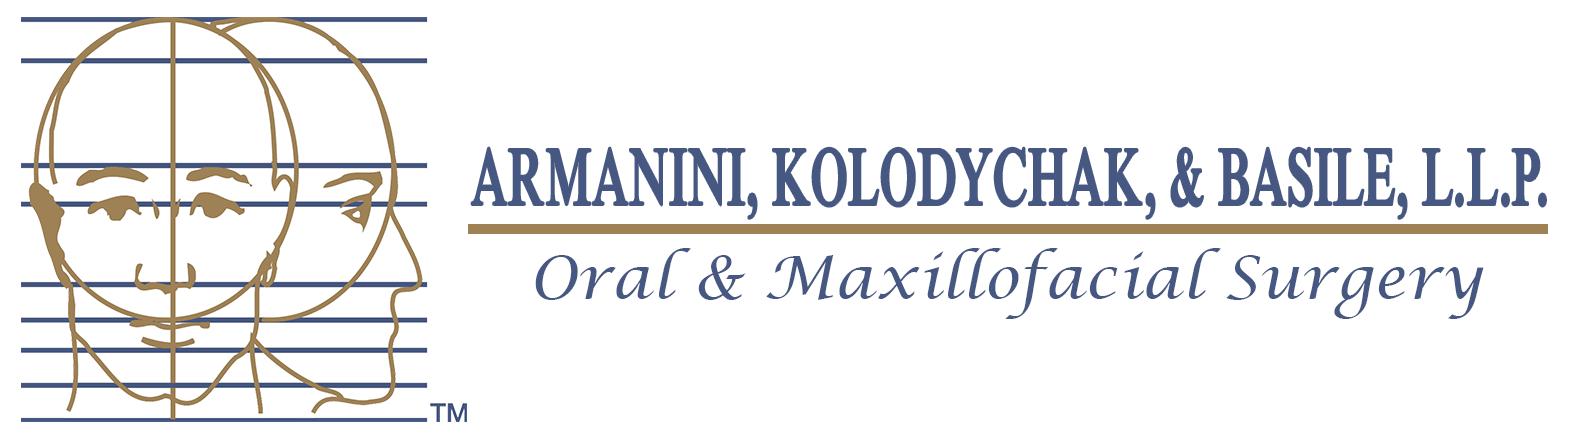 Armanini, Kolodychak & Basile, LLP